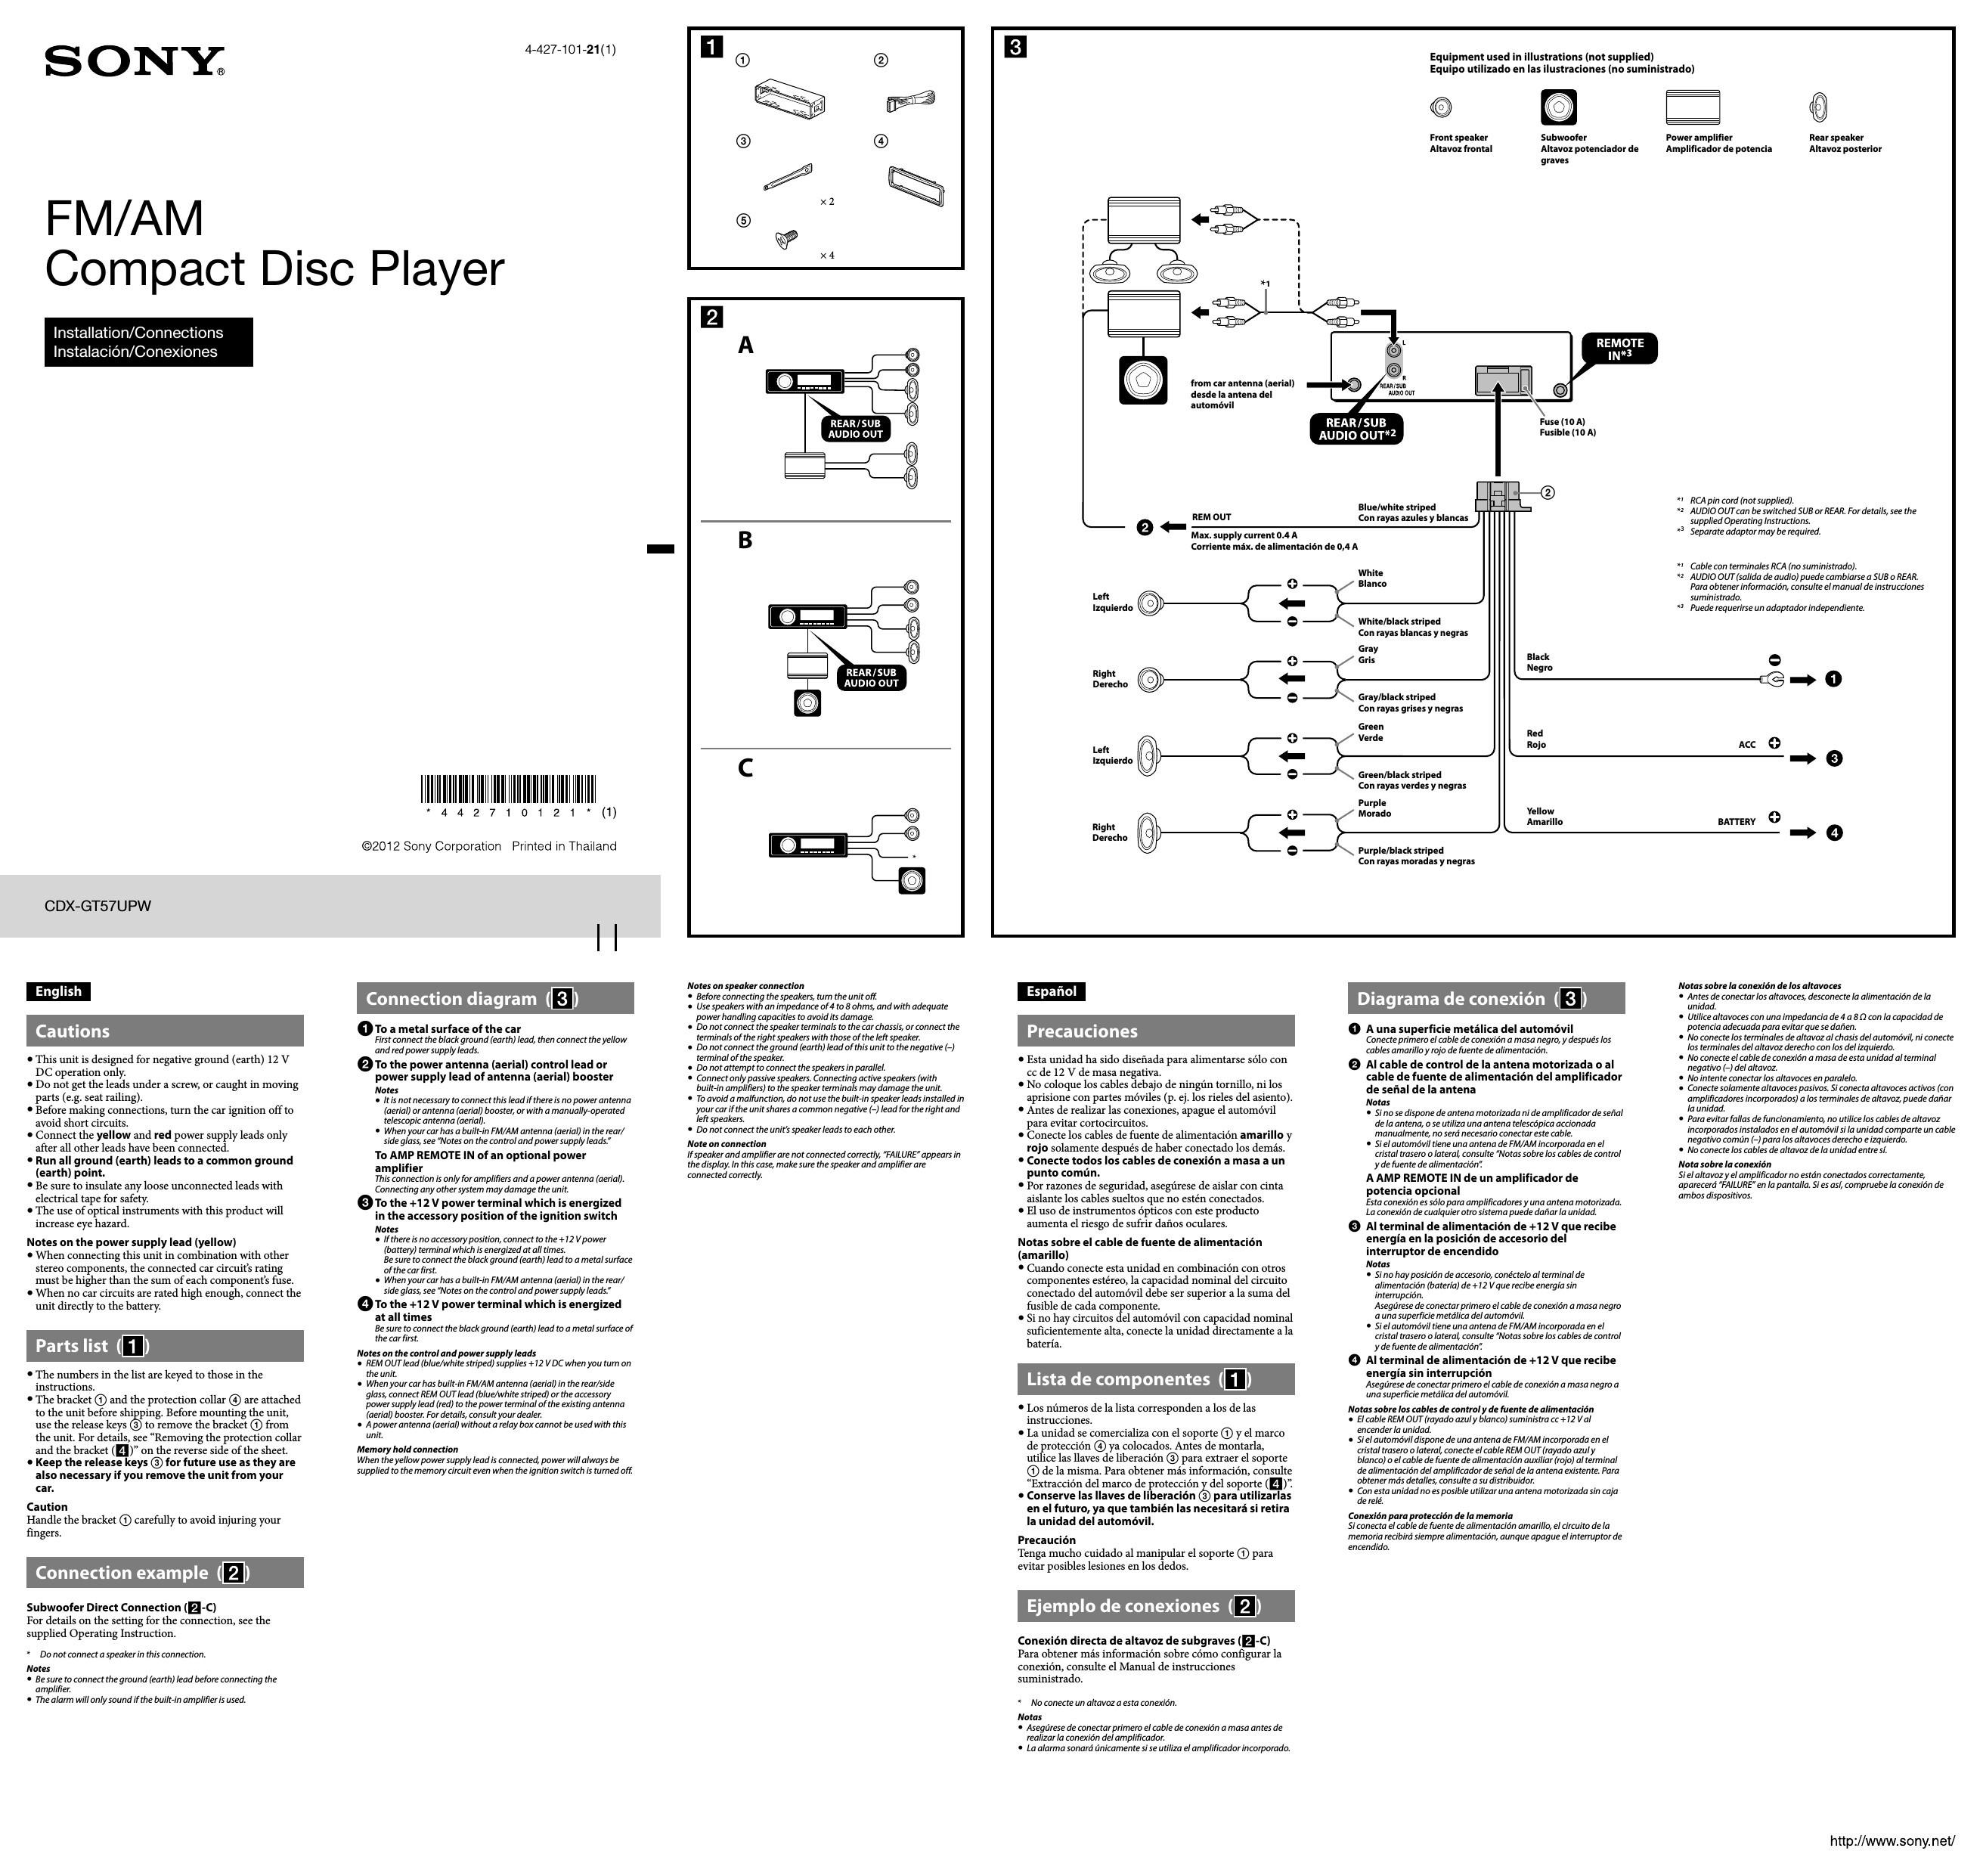 Mnl-4500] Installing Sony Car Stereo User Manual   2019 Ebook Library - Sony Xplod Car Stereo Wiring Diagram